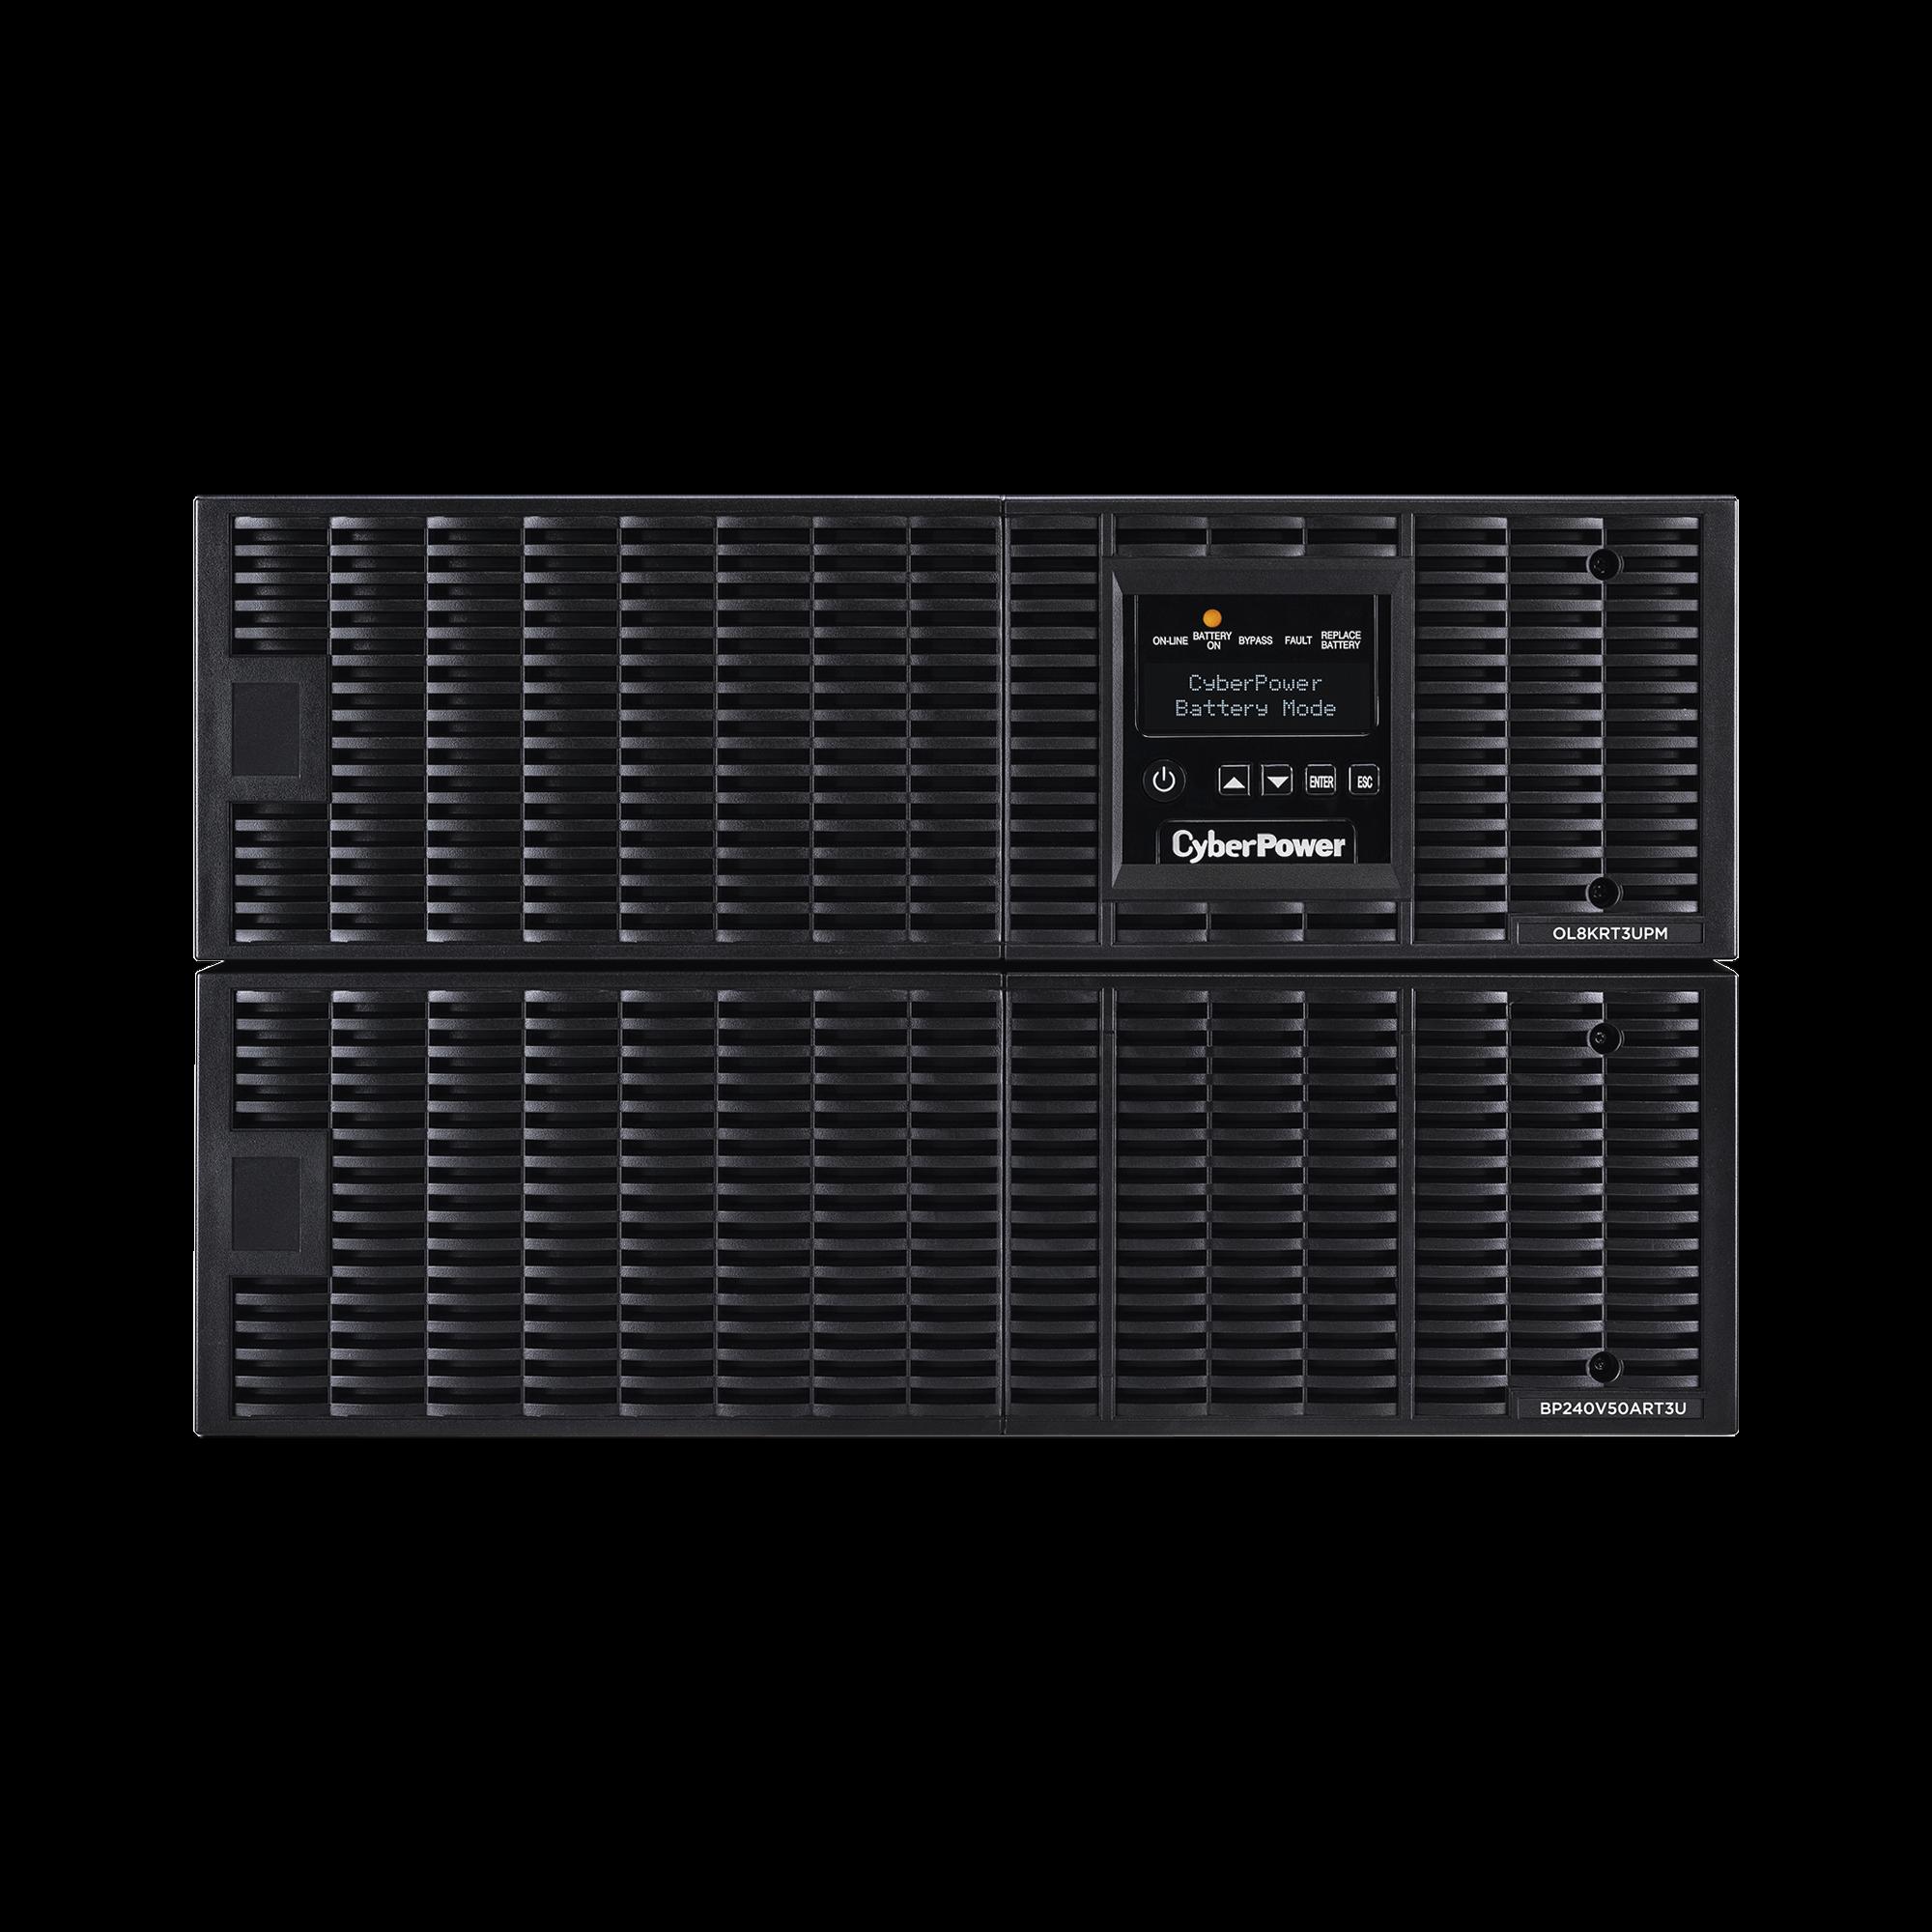 UPS de 8000 VA/ 7200 W, Online Doble Conversión, 200 - 240 Vac de Salida, Terminal Hardwired, Onda Senoidal Pura, Torre o Rack de 6 UR, Con 3 Tomas NEMA L6-30R